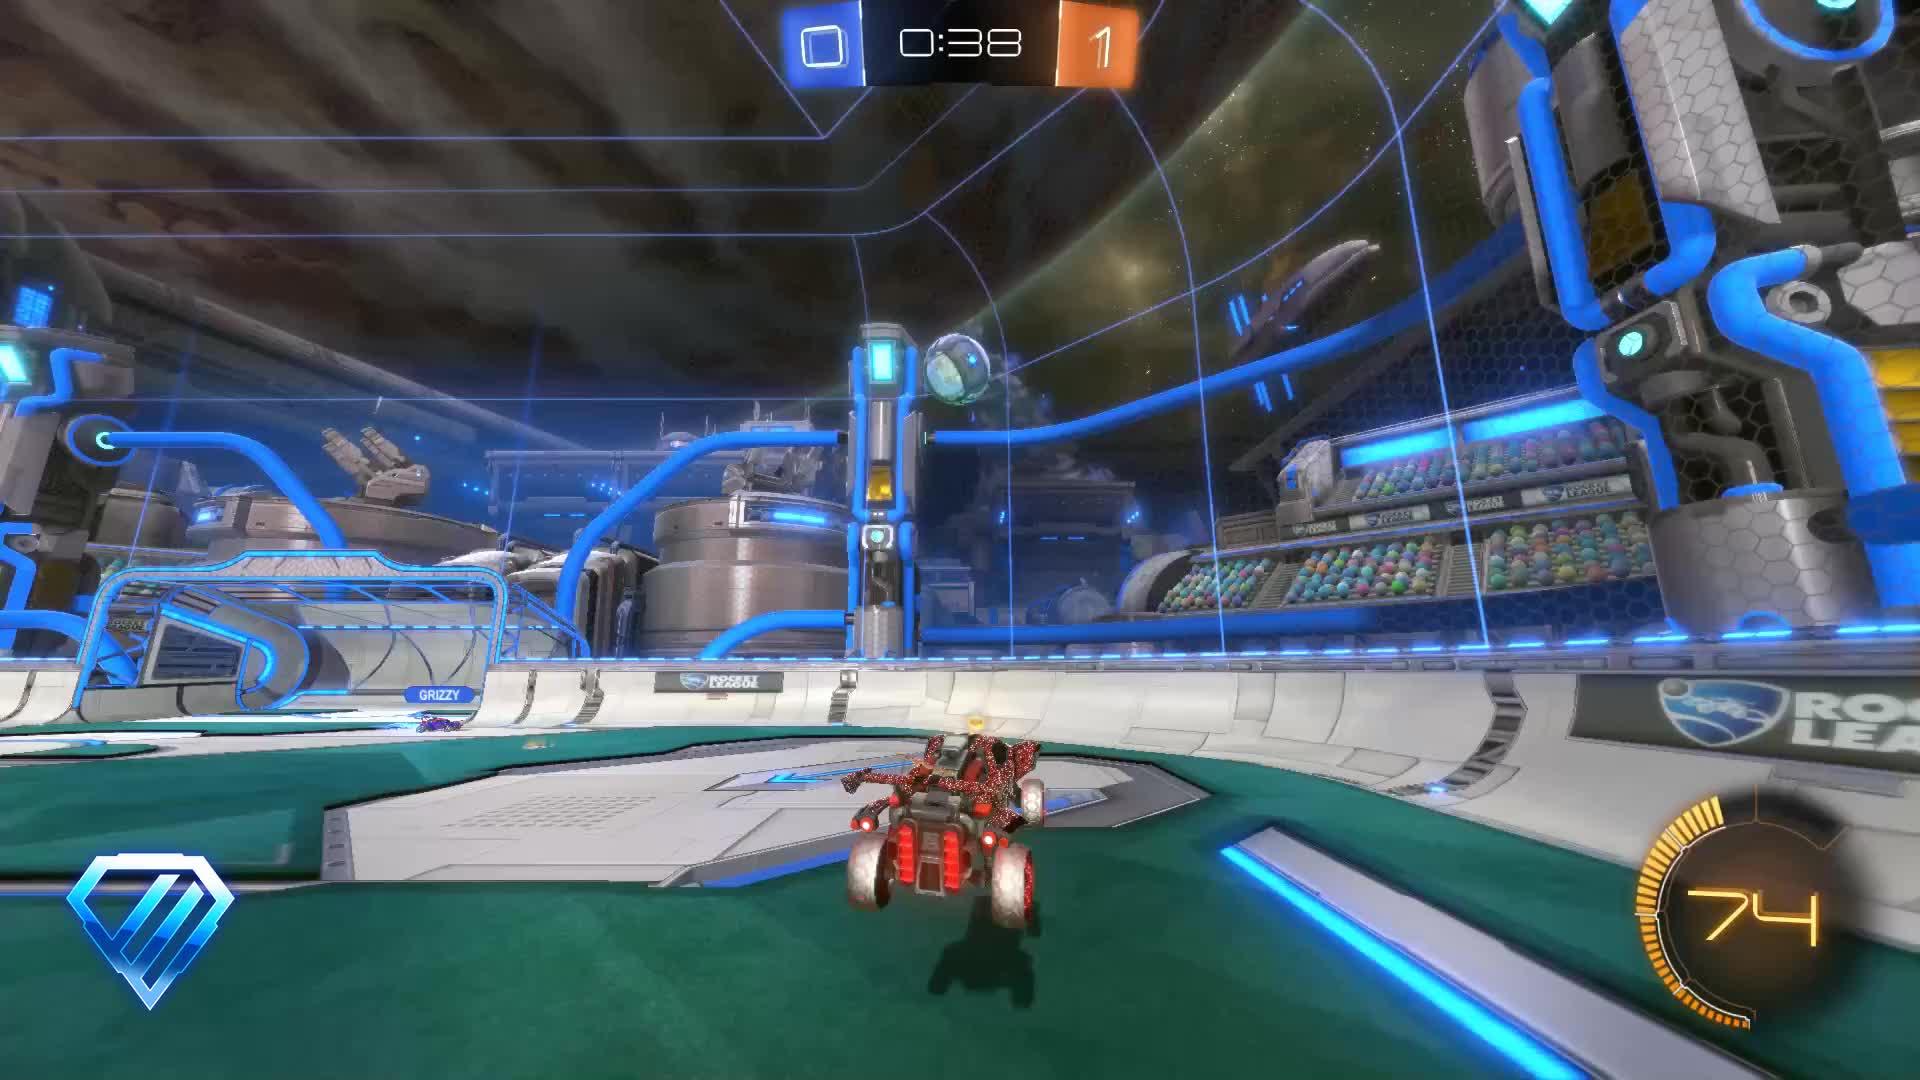 Gif Your Game, GifYourGame, Goal, OrangeCrush413, Rocket League, RocketLeague, Goal 2: OrangeCrush413 GIFs